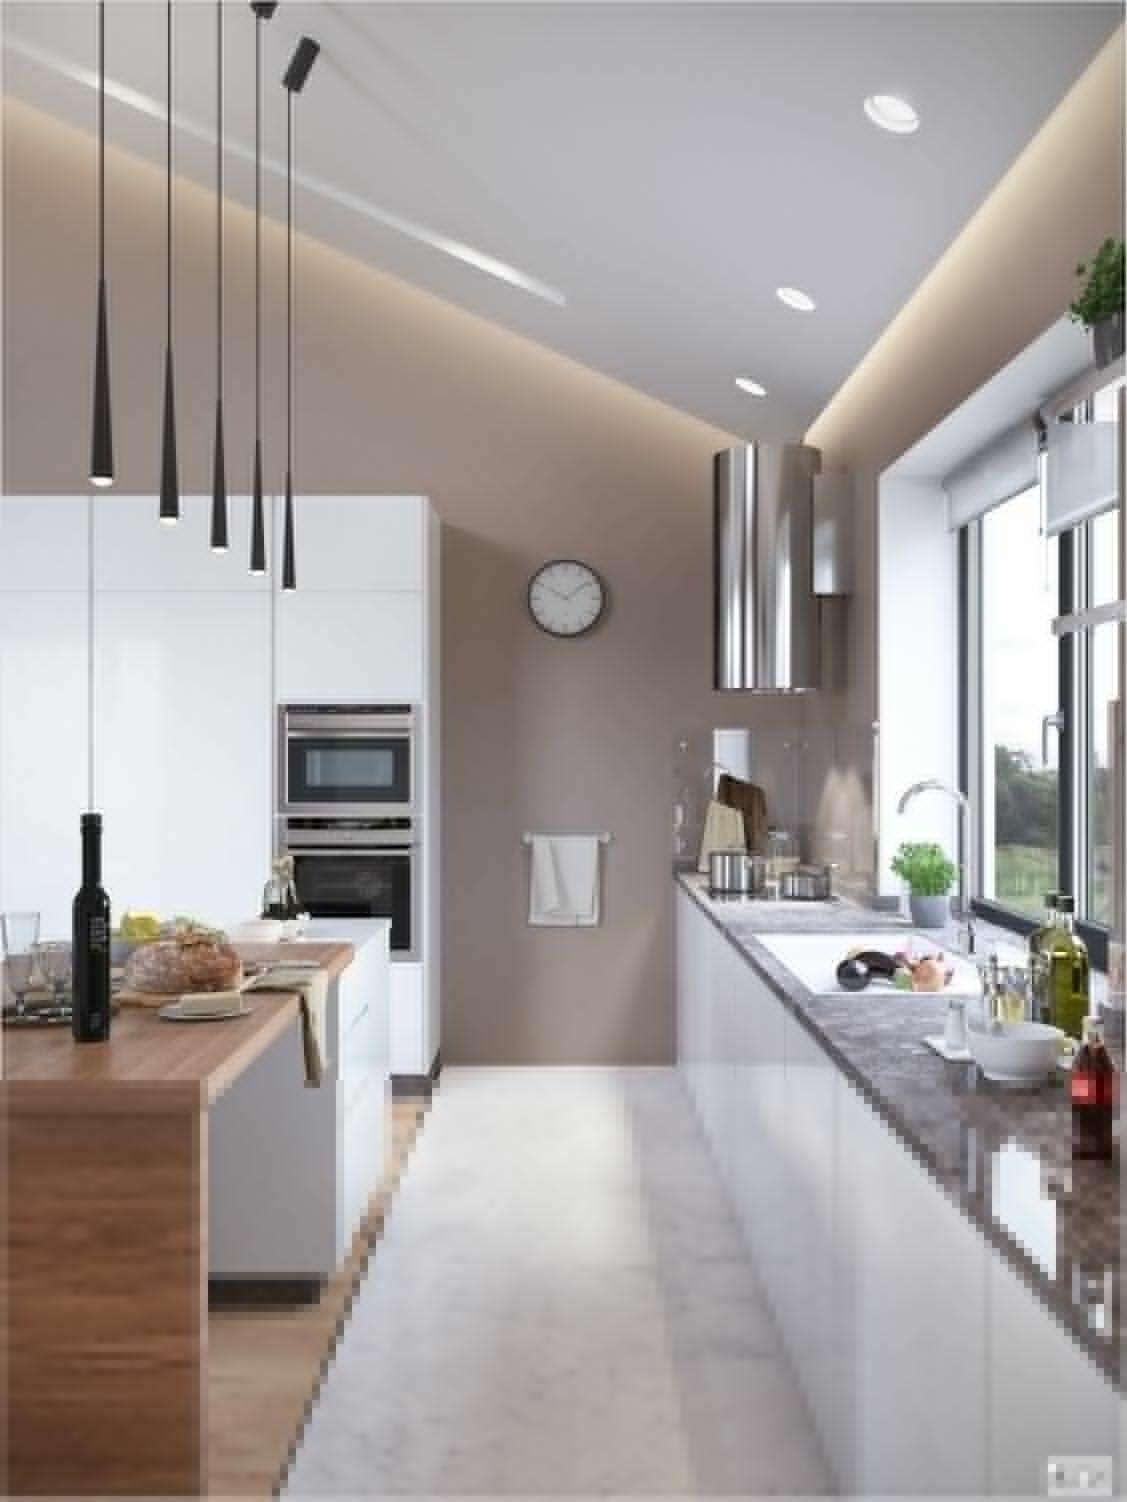 Open Kitchen Design Cozy And Classic Open Kitchen Kitchen Design Open Kitchen Design Modern Kitchen Design